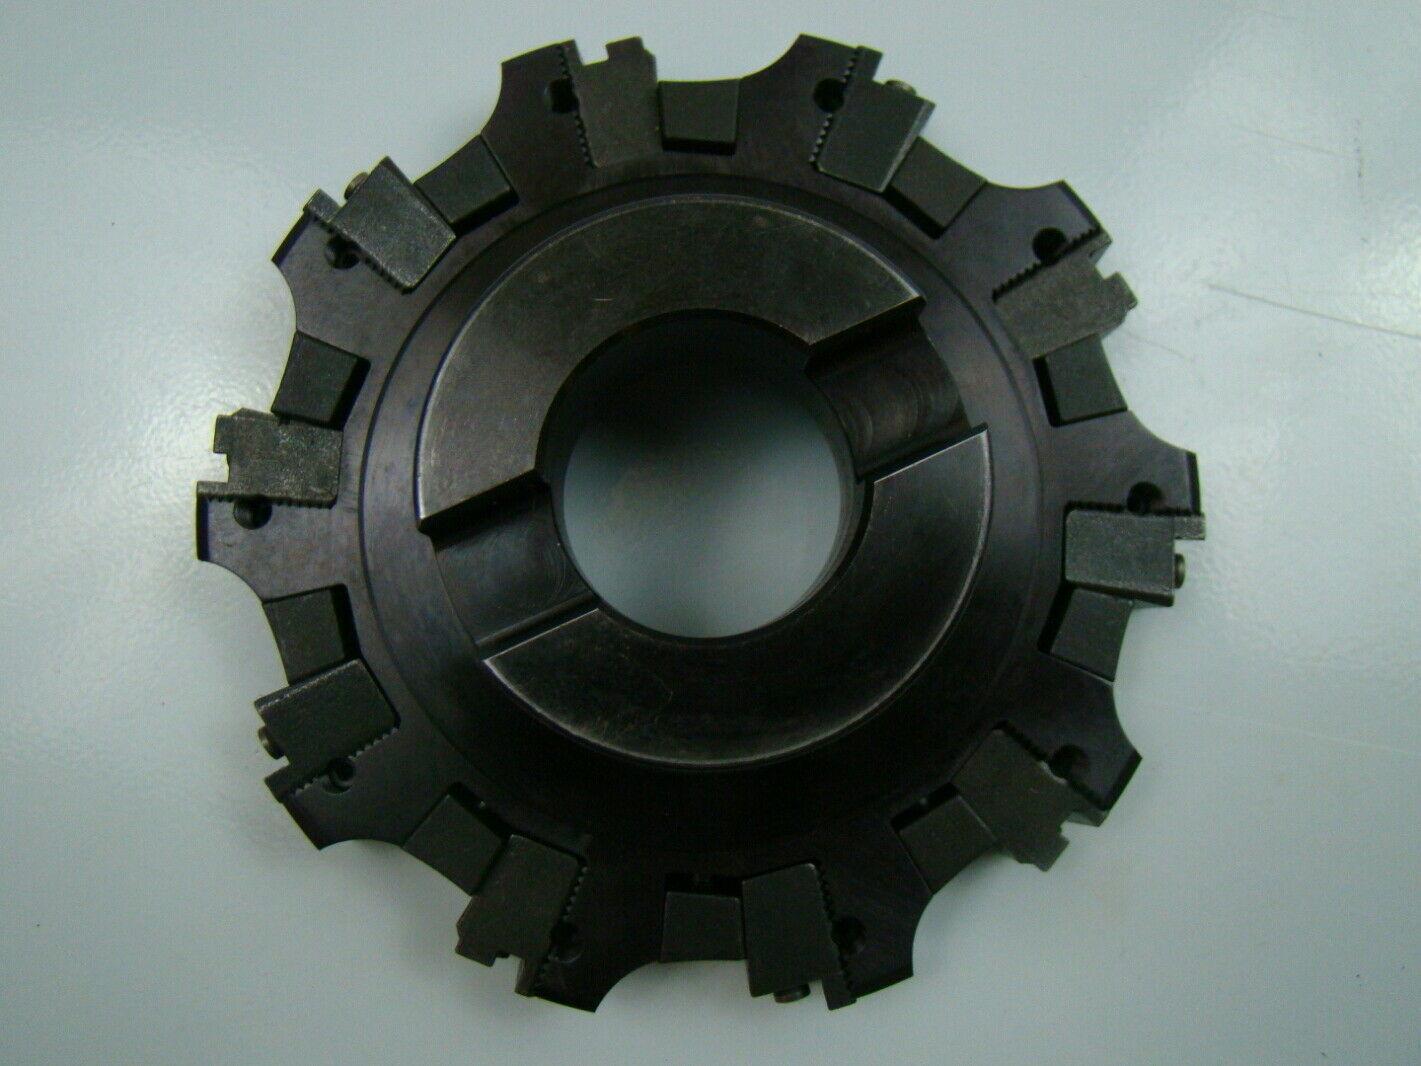 "SECO 6/"" Milling Cutter Width 18.5-24.3 R335.18-06.00-073-15-10"